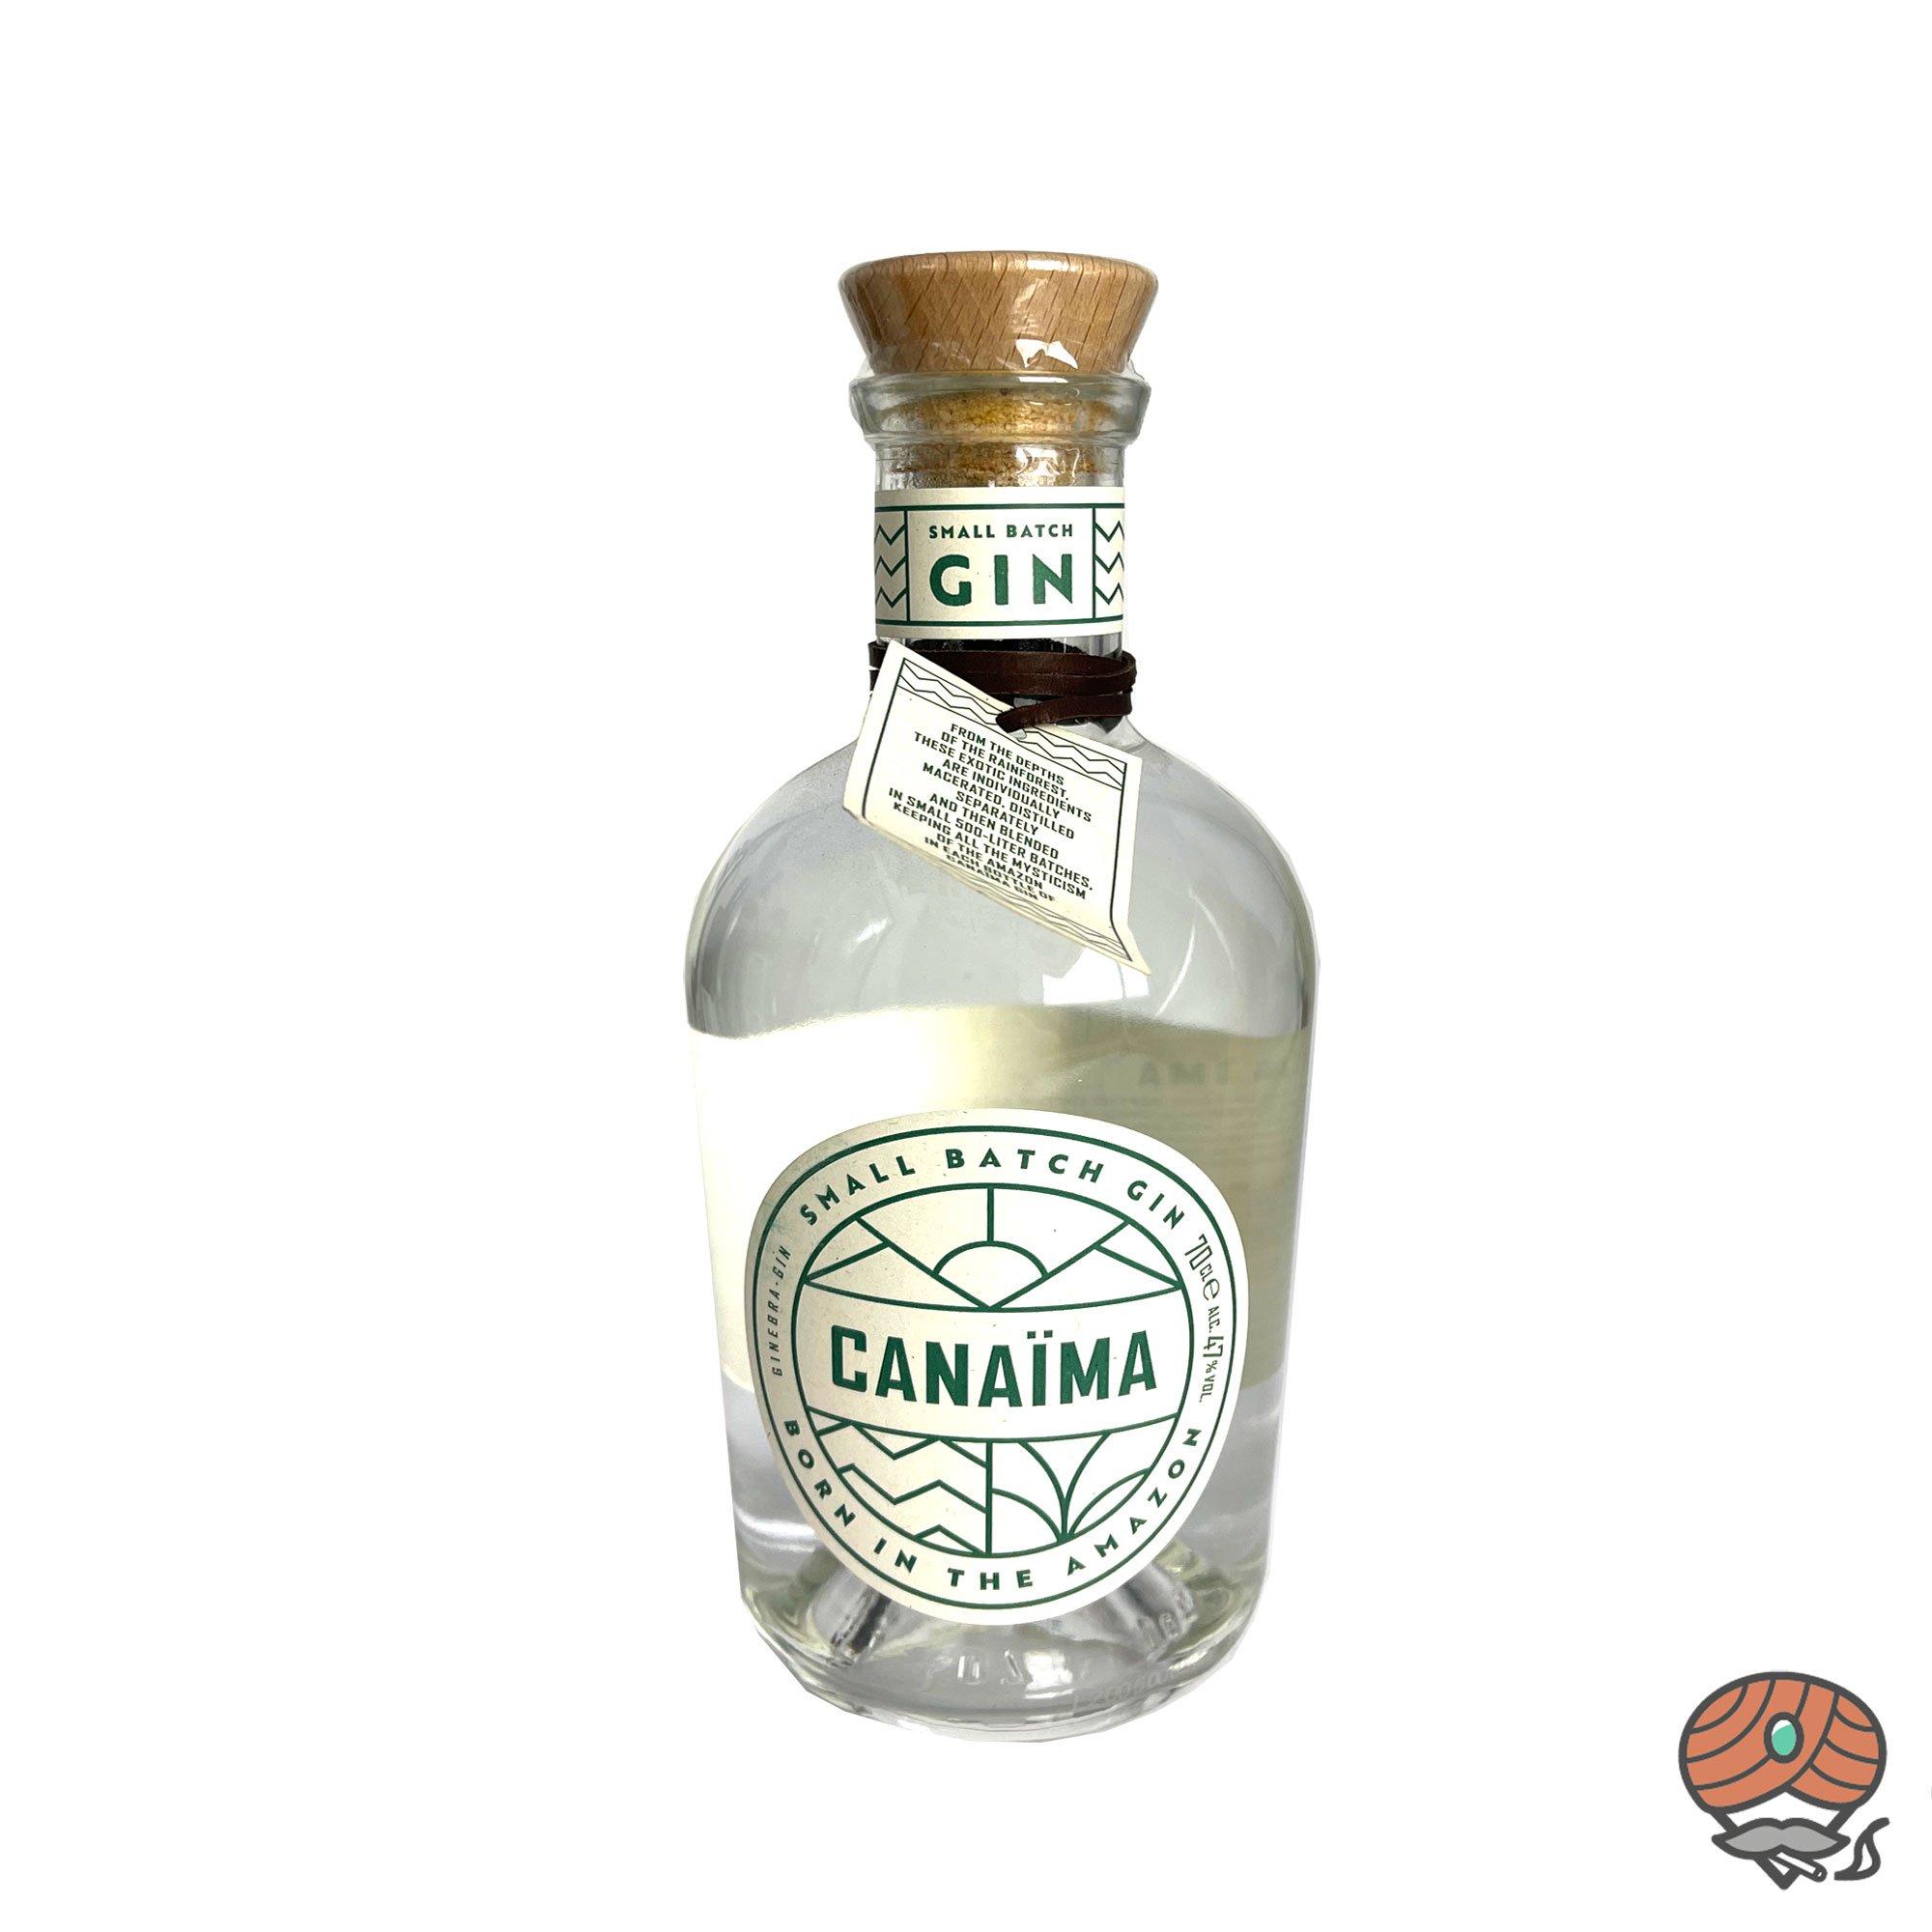 Canaima  Small Batch Dry Gin 0,7l, alc. 47 Vol.-% aus Venezuela